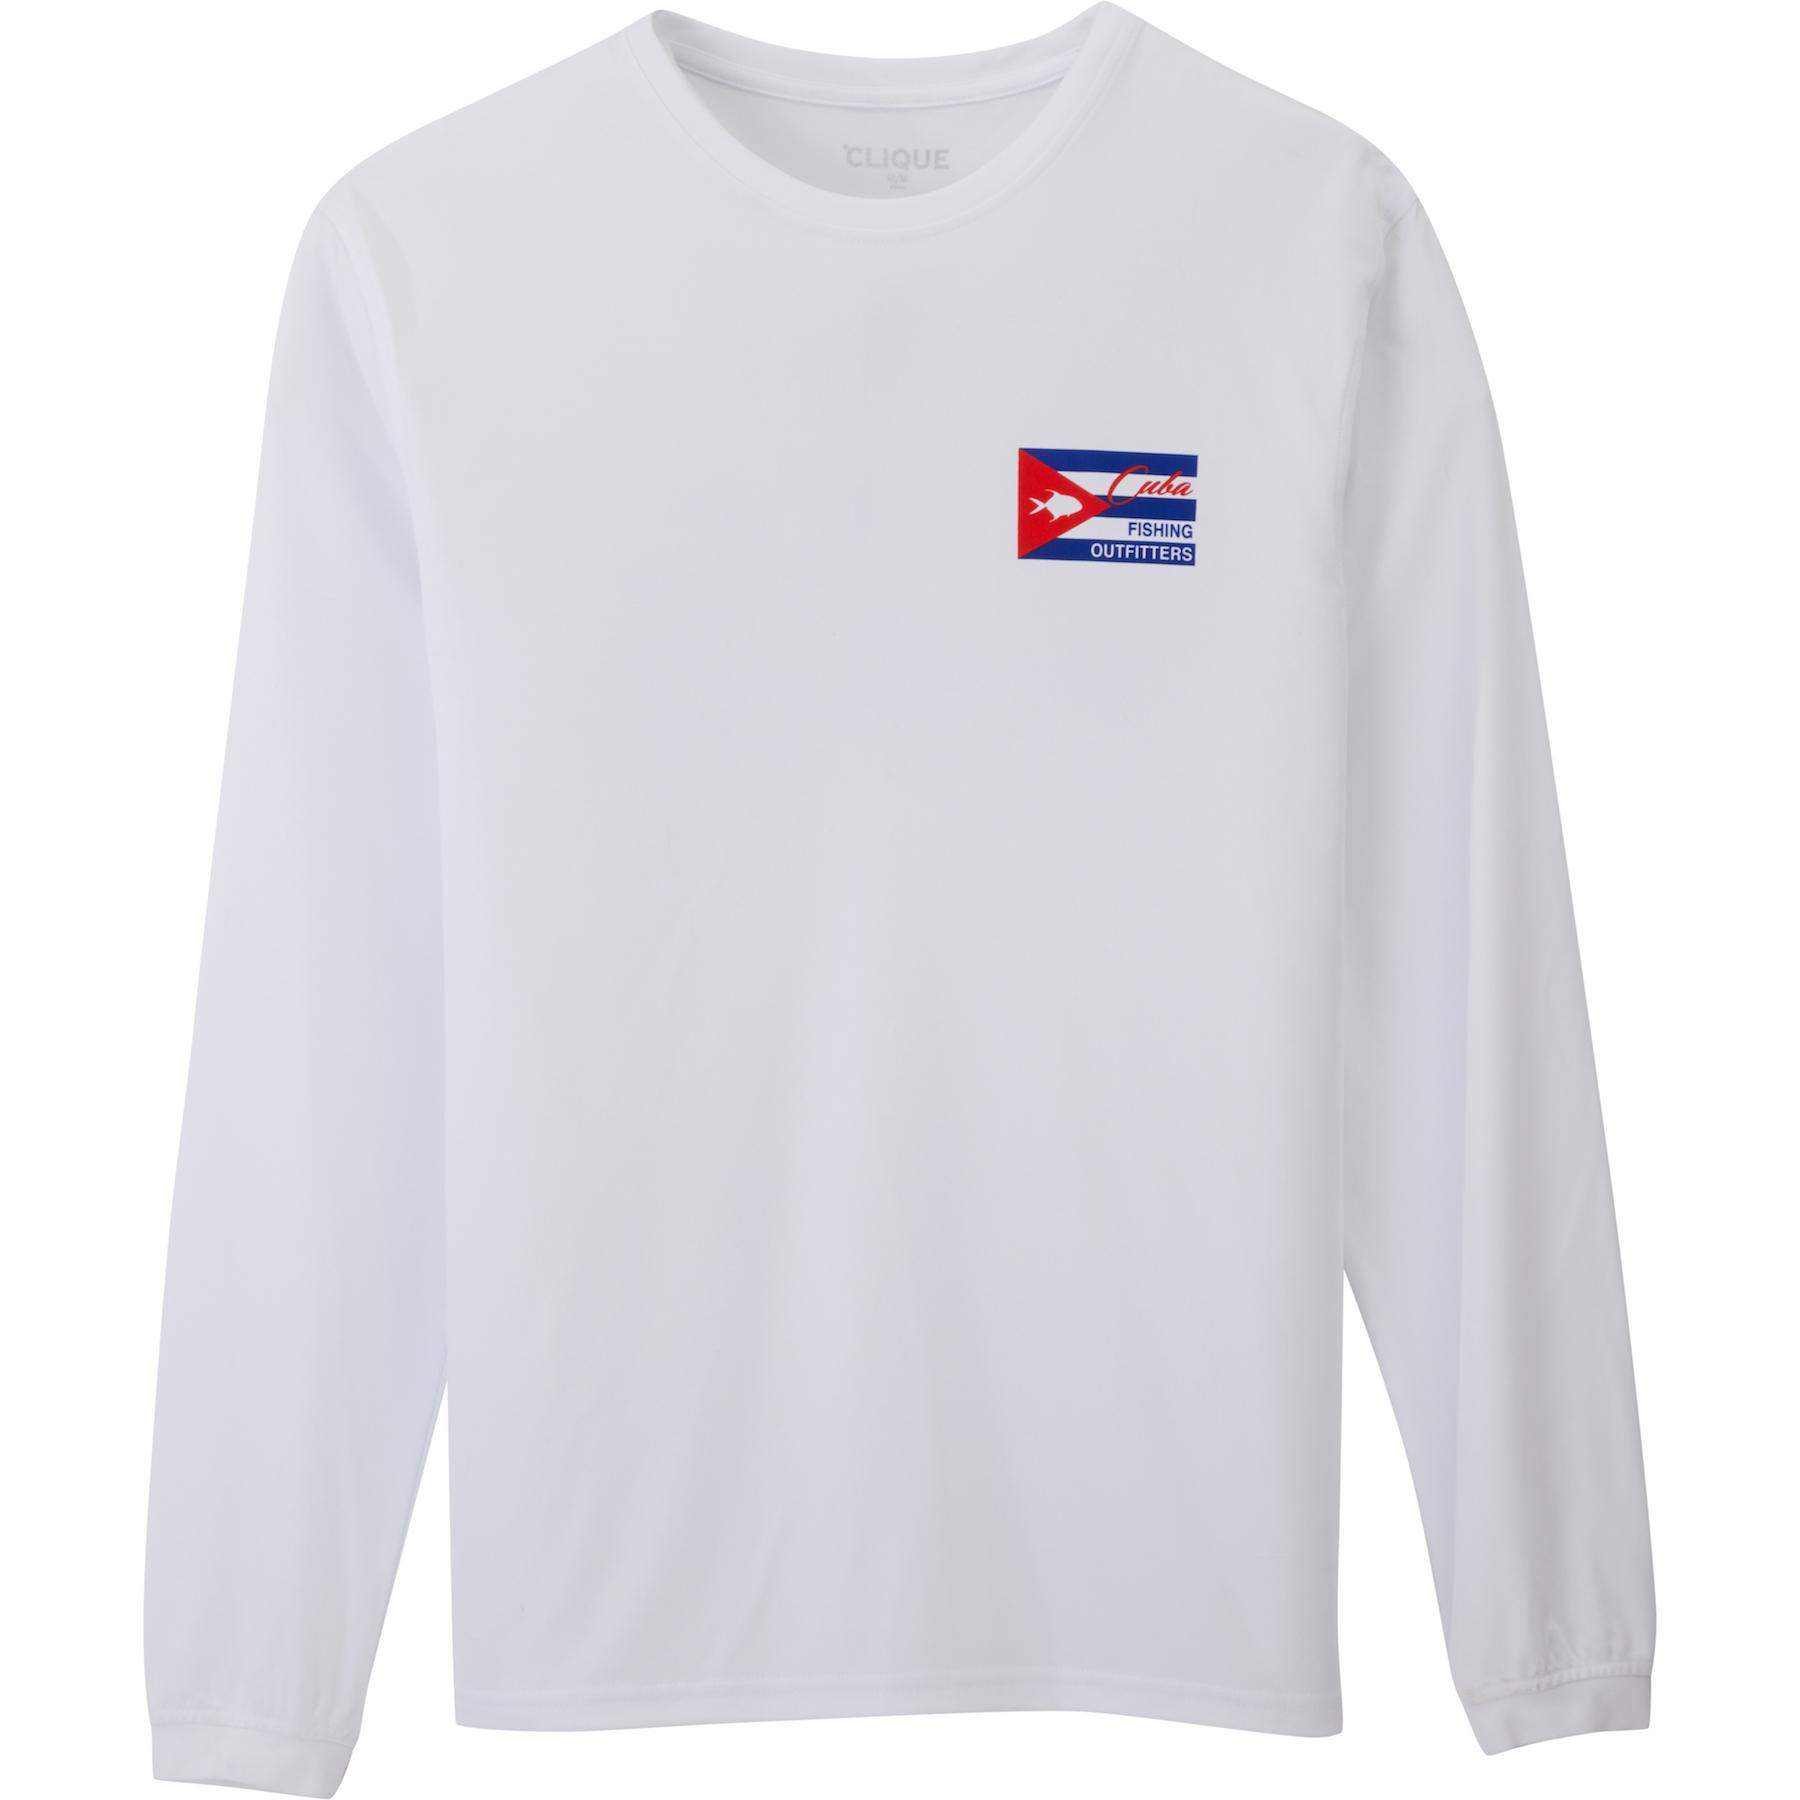 CubaSunShirt-White_Front copy.jpg